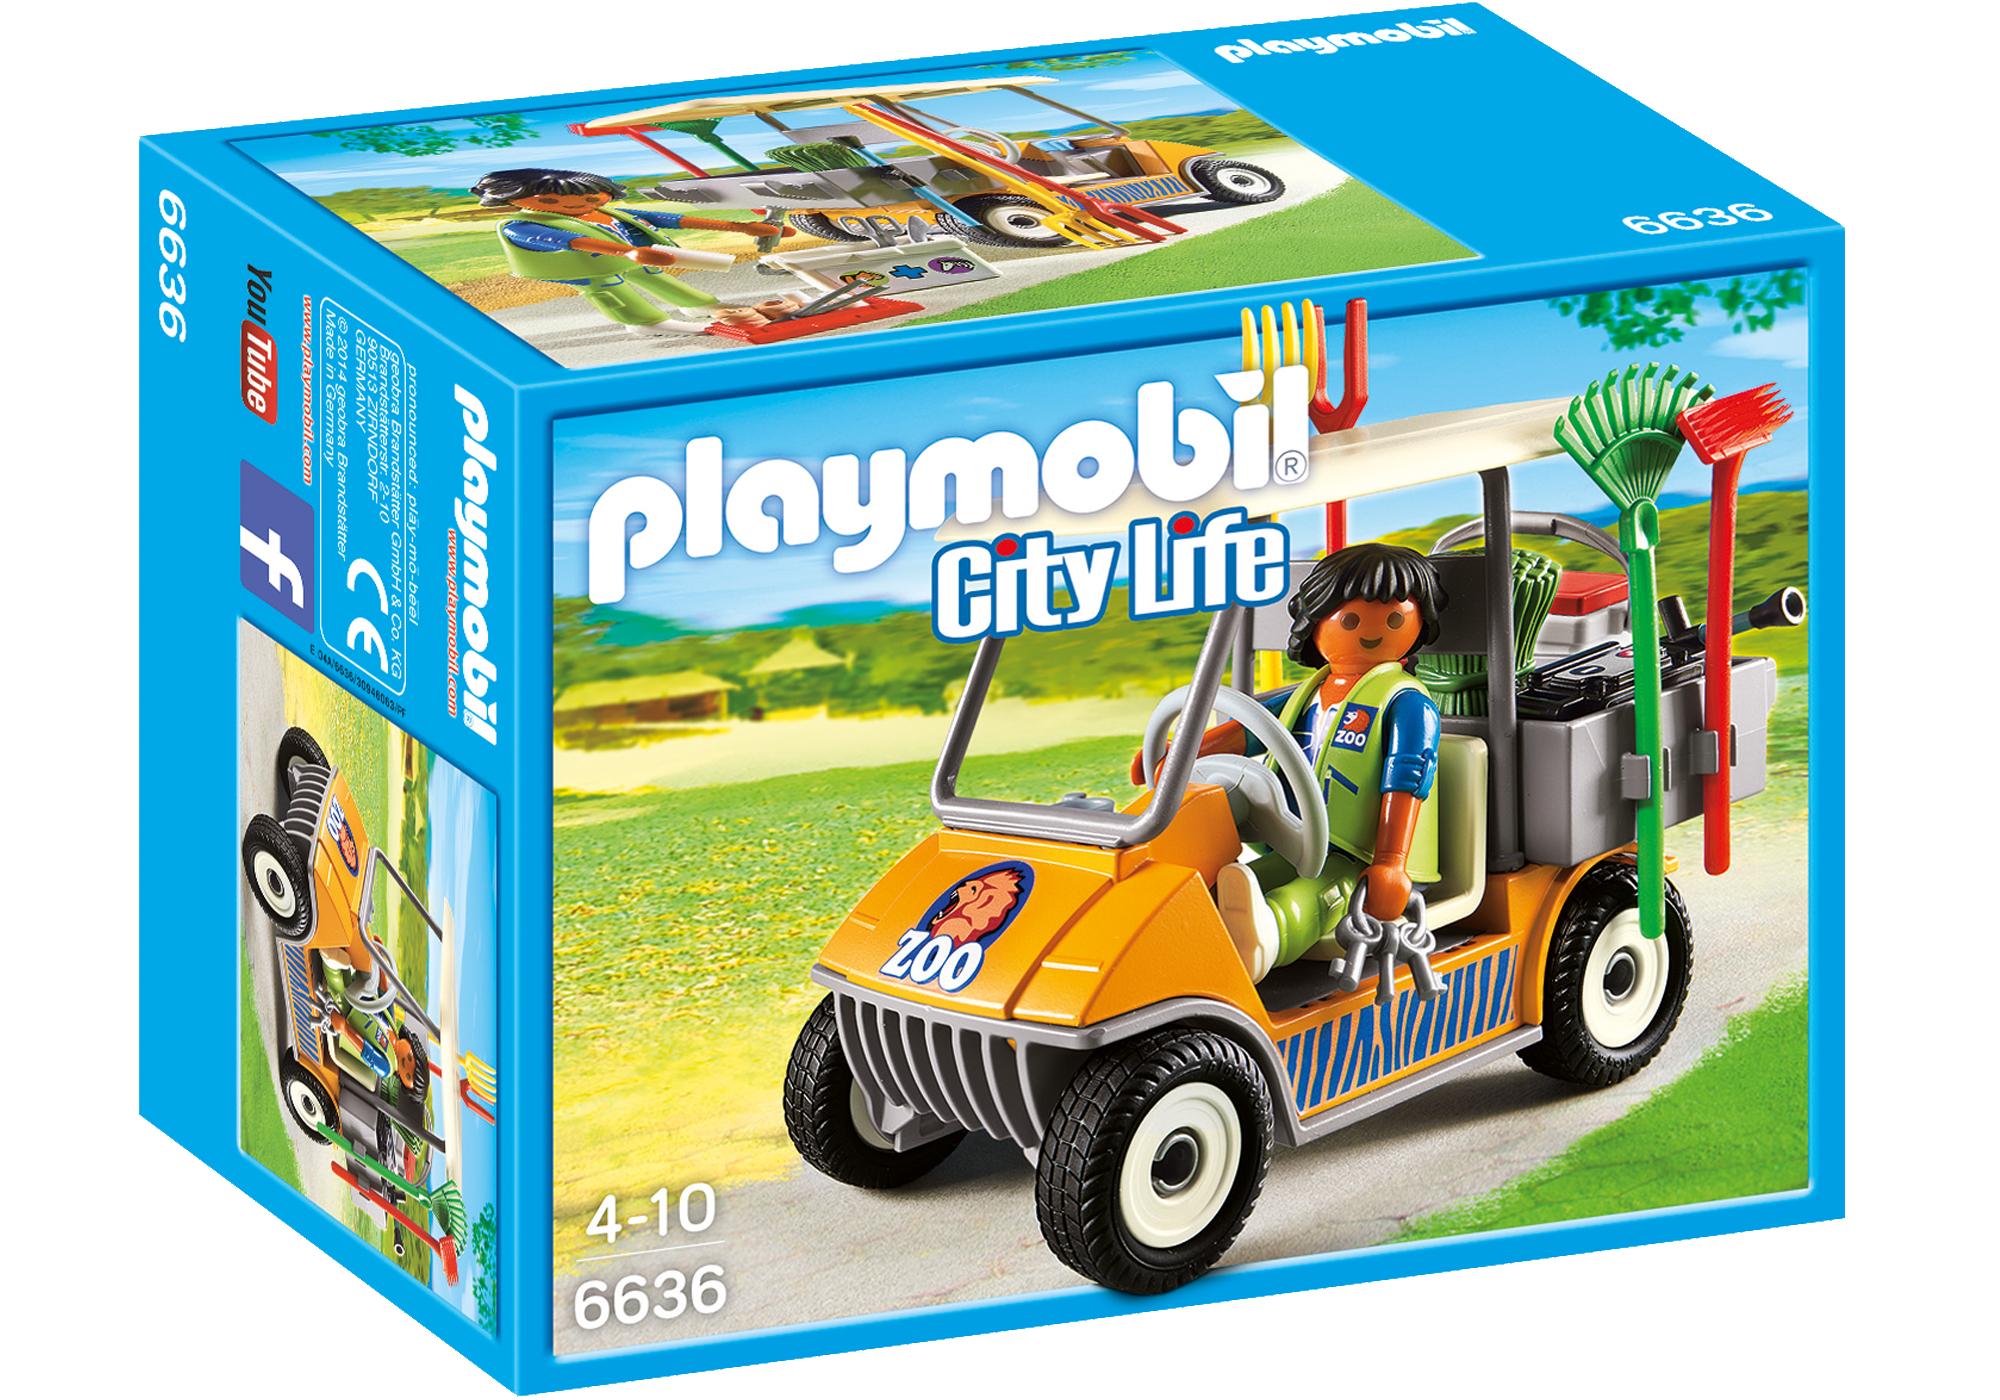 http://media.playmobil.com/i/playmobil/6636_product_box_front